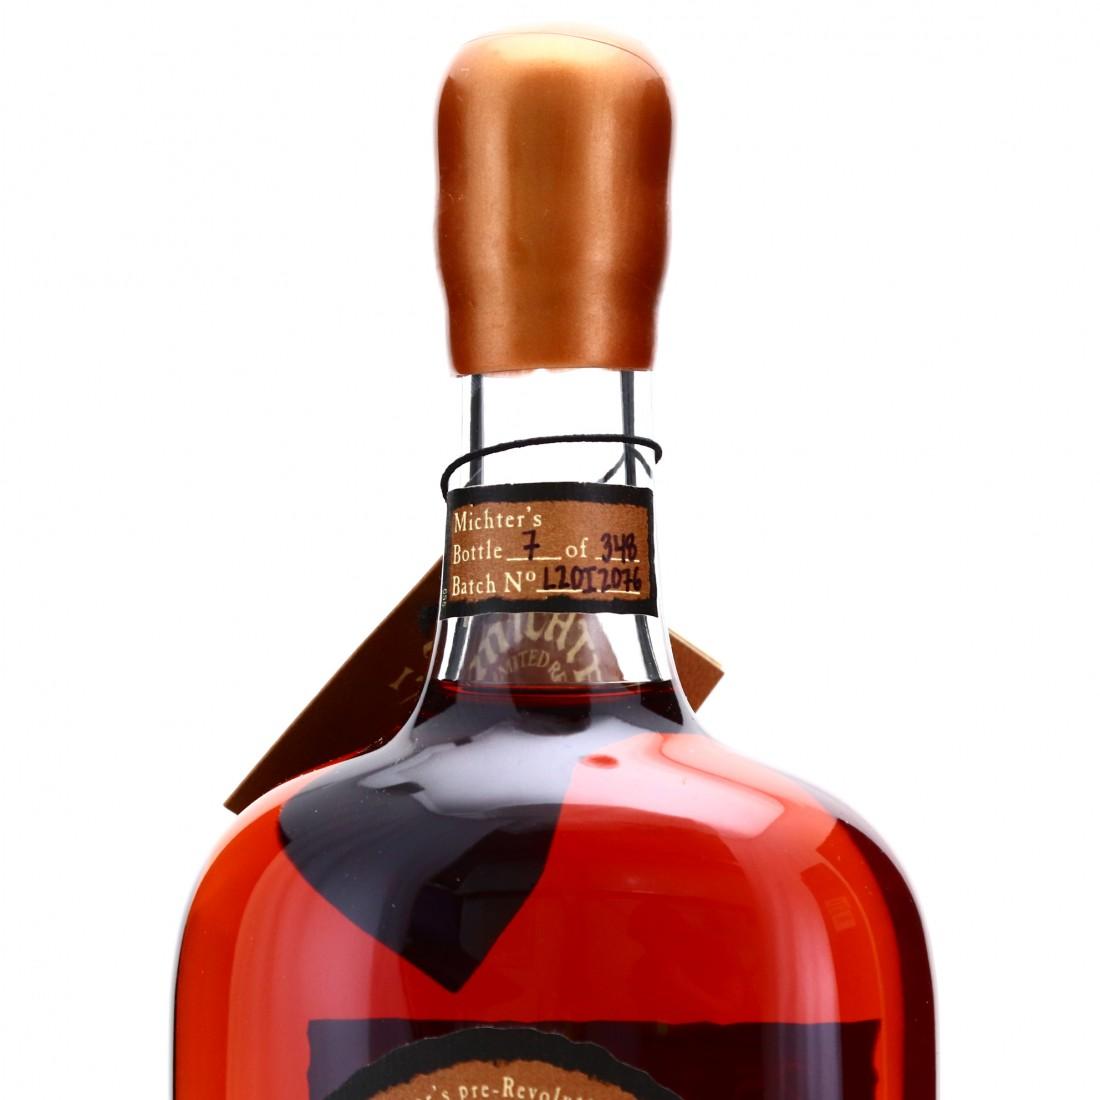 Michter's 25 Year Old Kentucky Straight Bourbon 2020 70cl